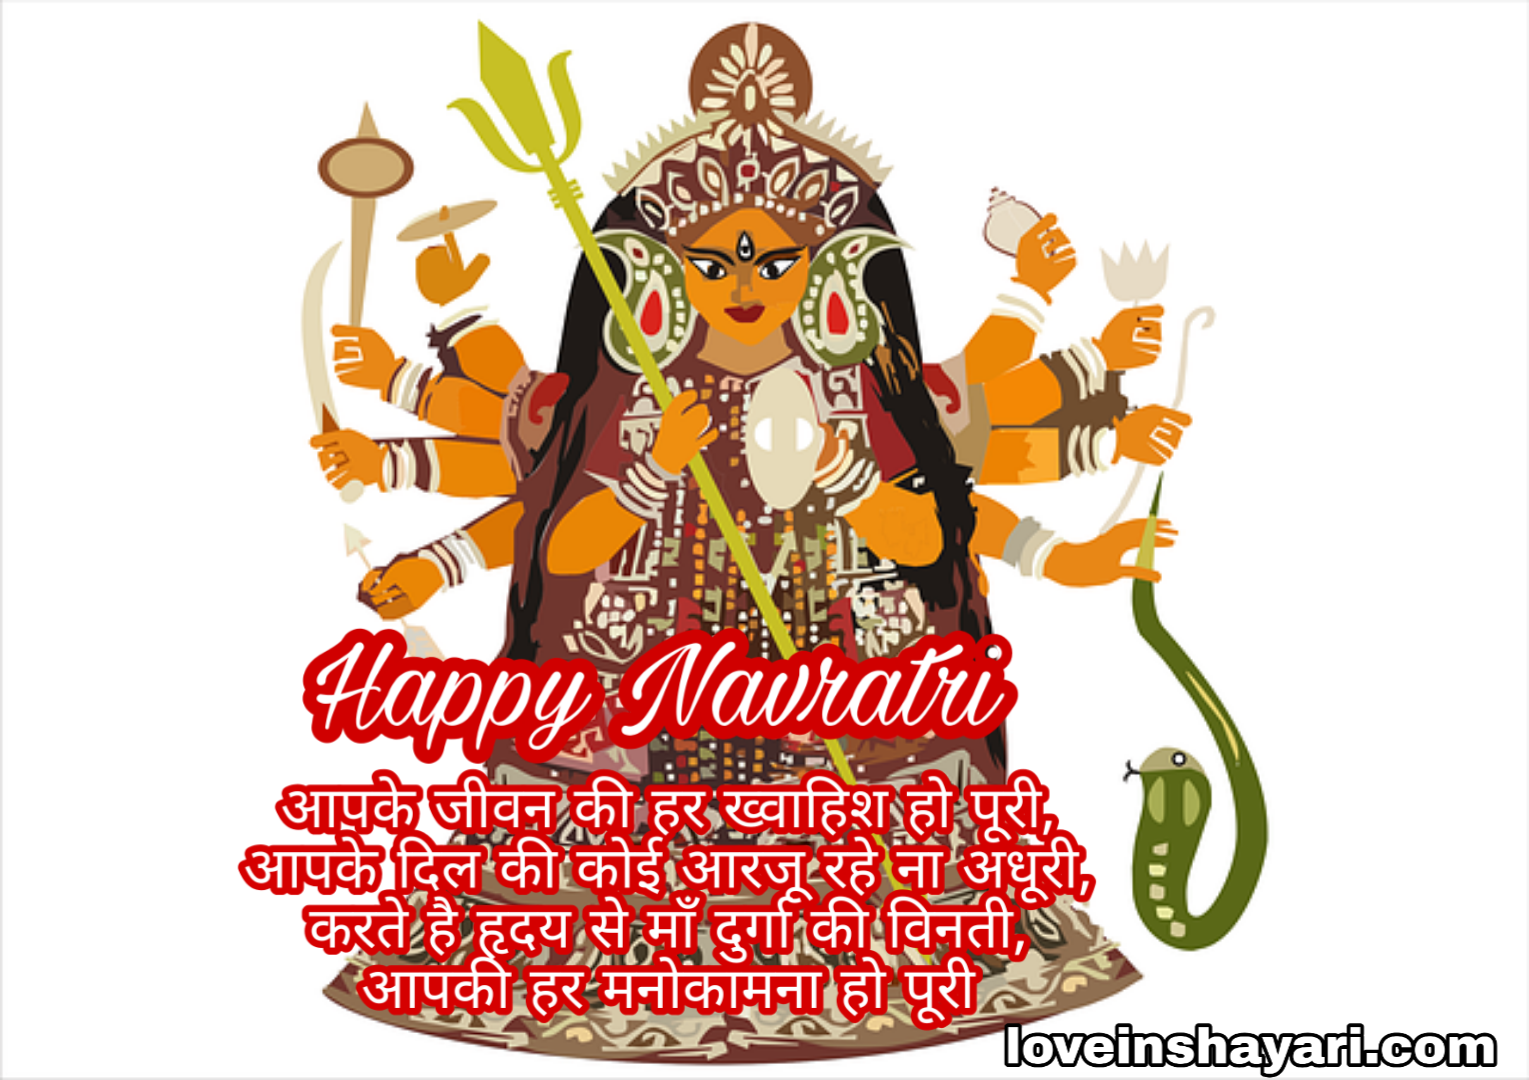 Happy Navratri wishes shayari message quotes